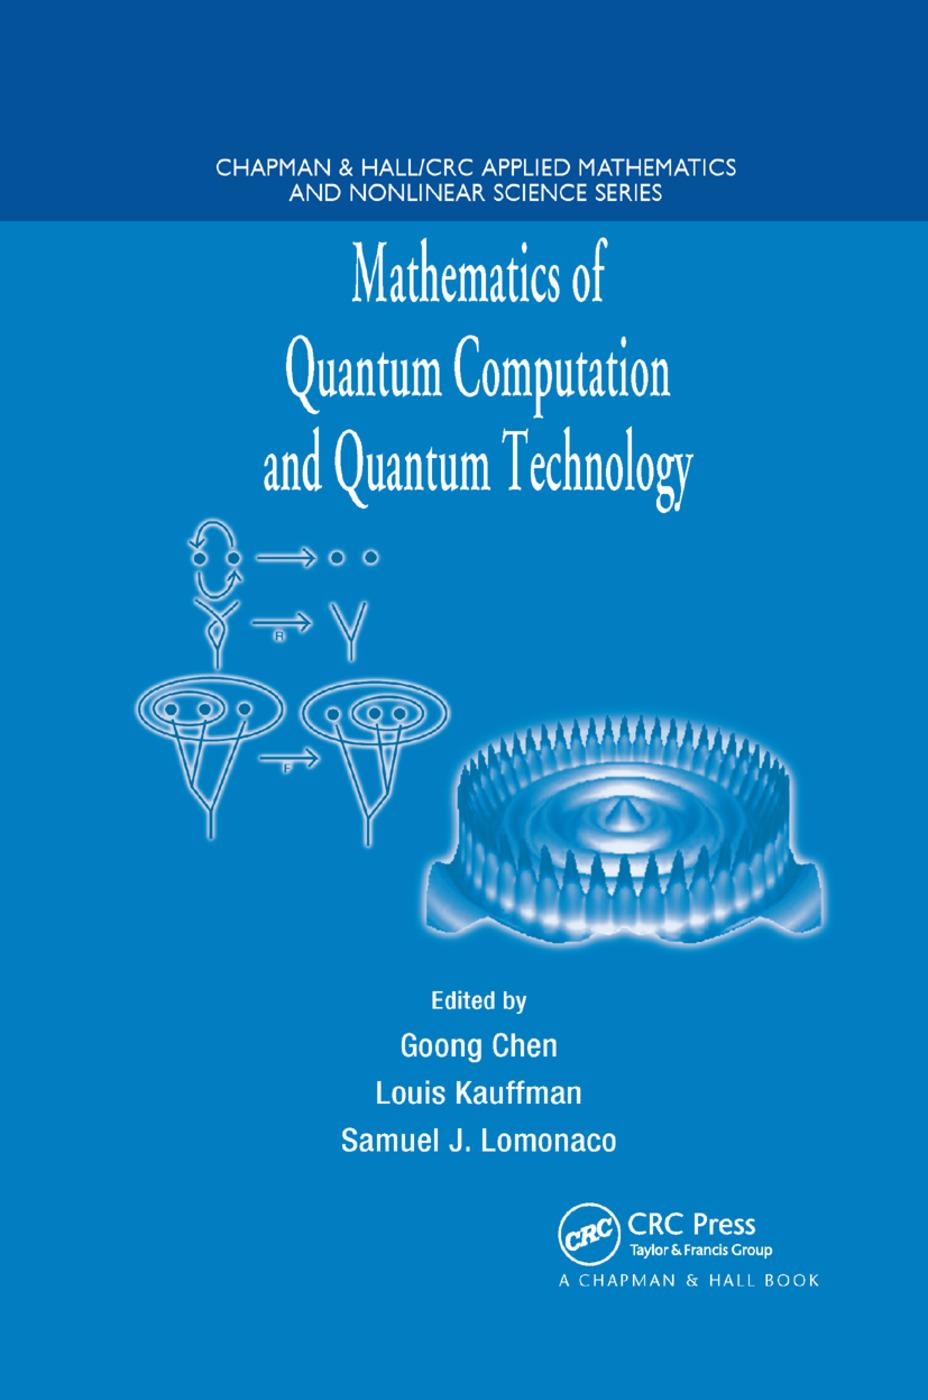 Mathematics of Quantum Computation and Quantum Technology: 1st Edition (Paperback) book cover